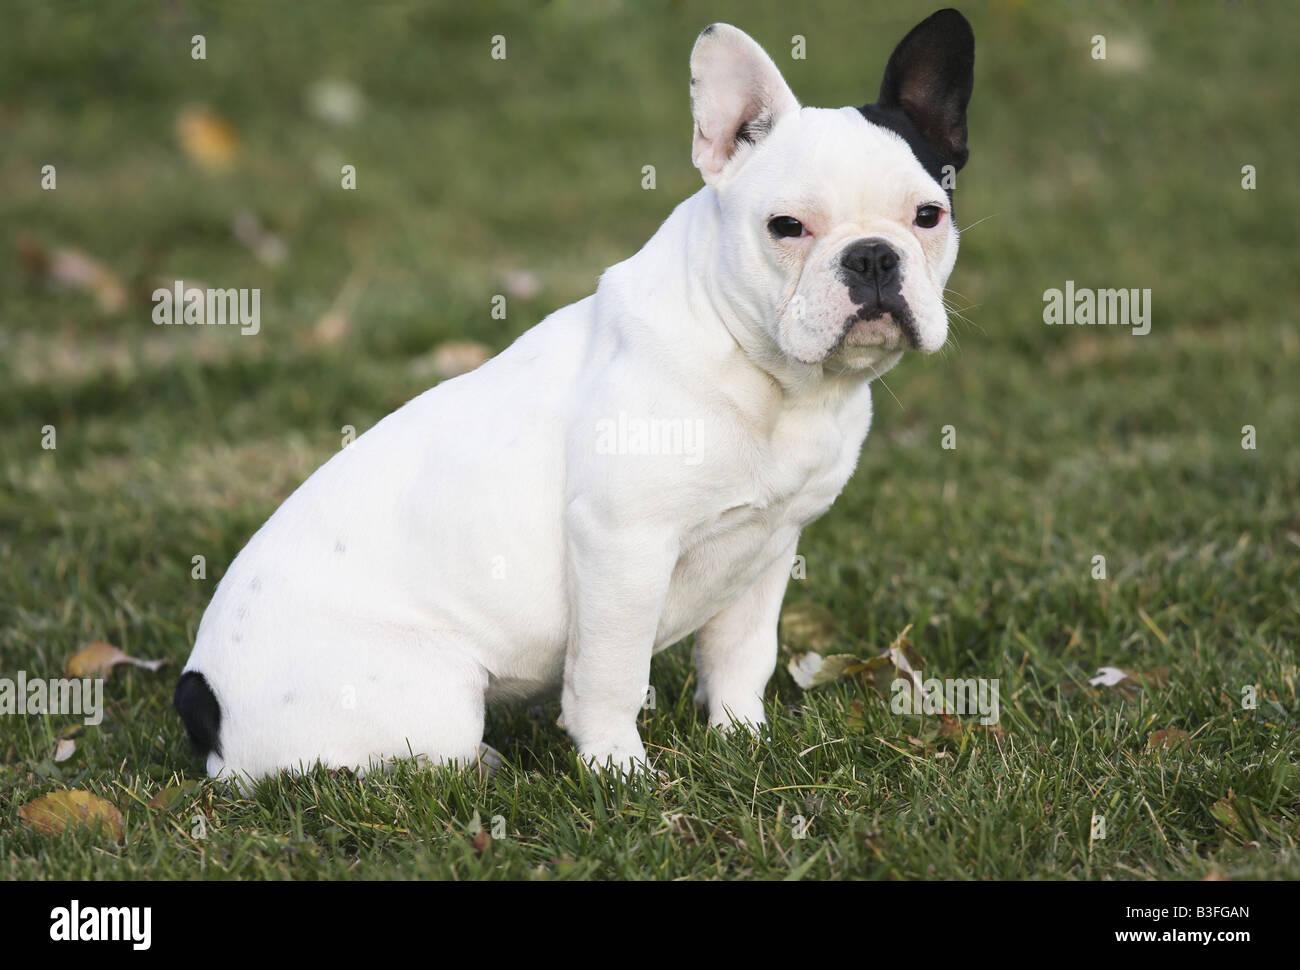 French Bulldog Sitting In Grass Immagini French Bulldog Sitting In